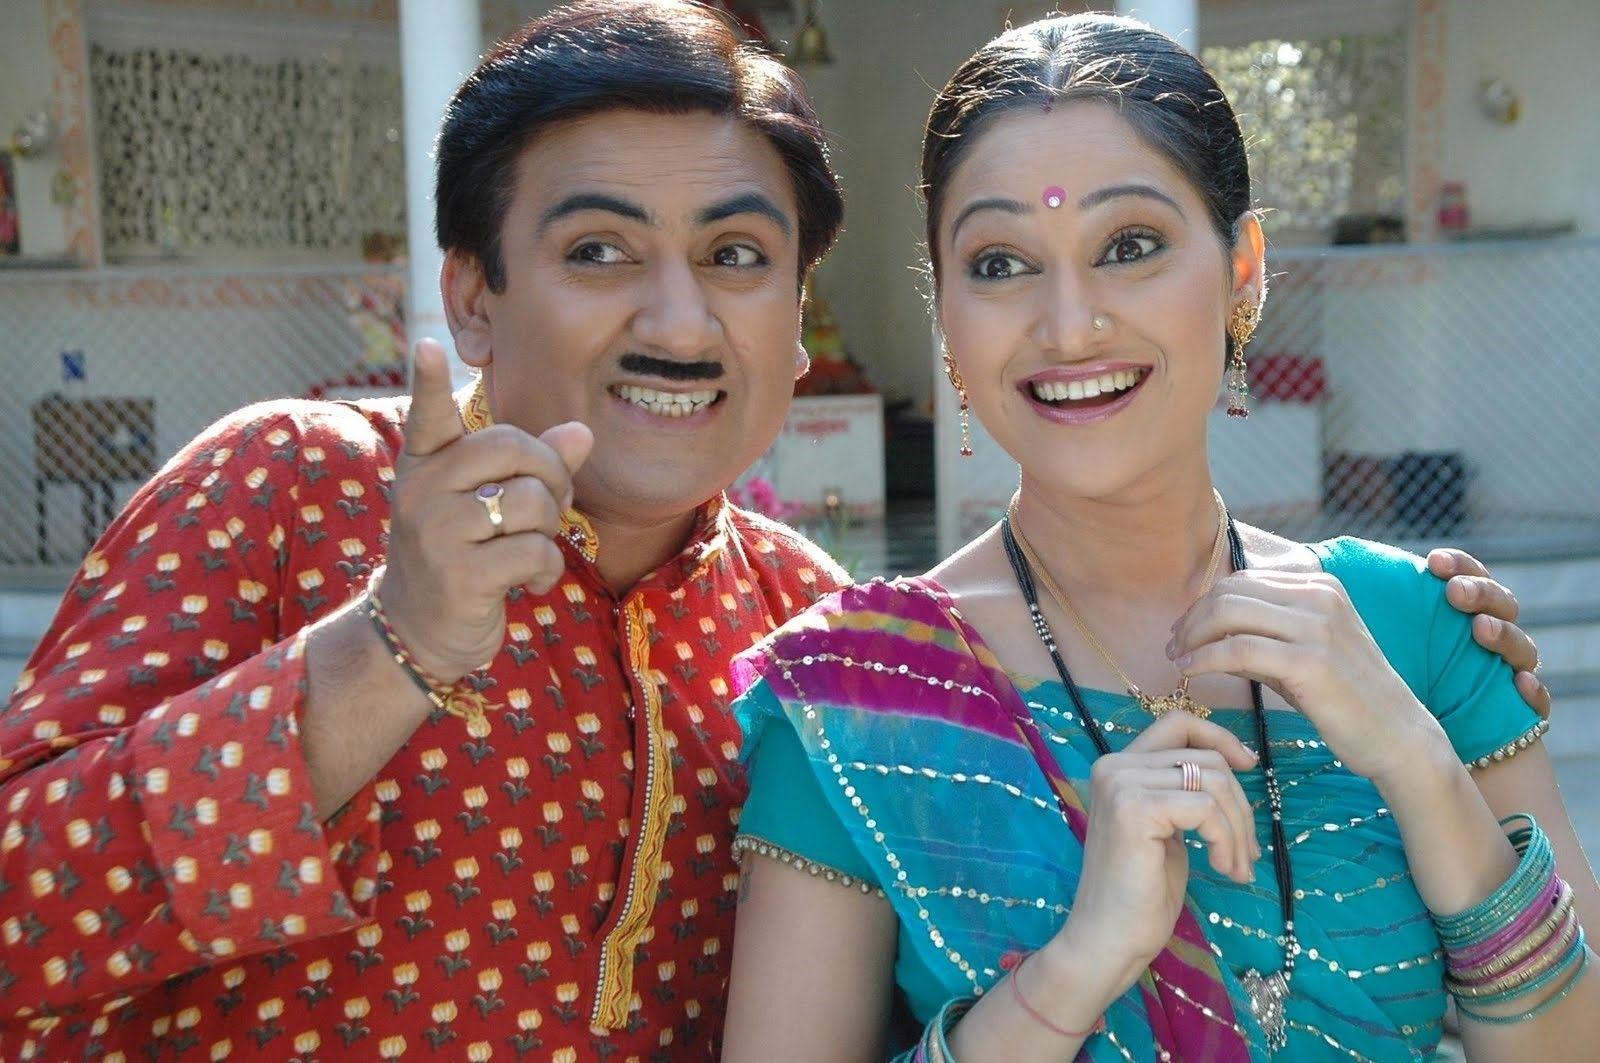 Search Sab Tv Tark Meheta Ka Oolta Chasma Actress Nude